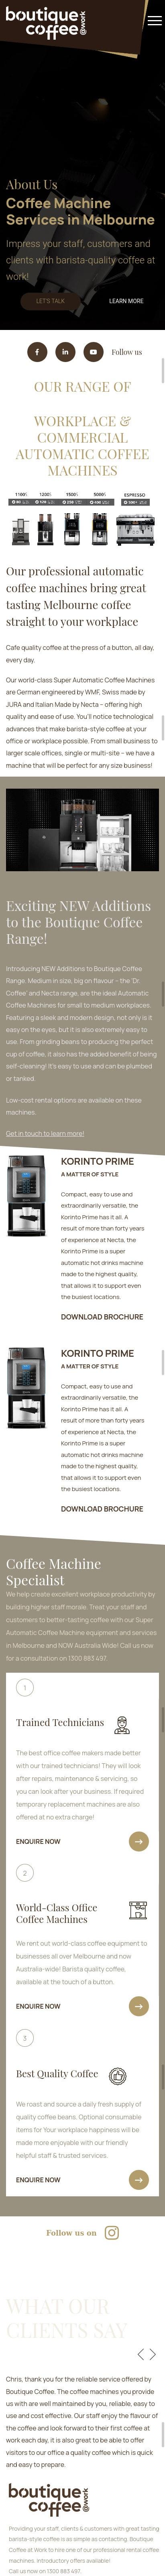 Web-design-Coffee_Machines_Boutique